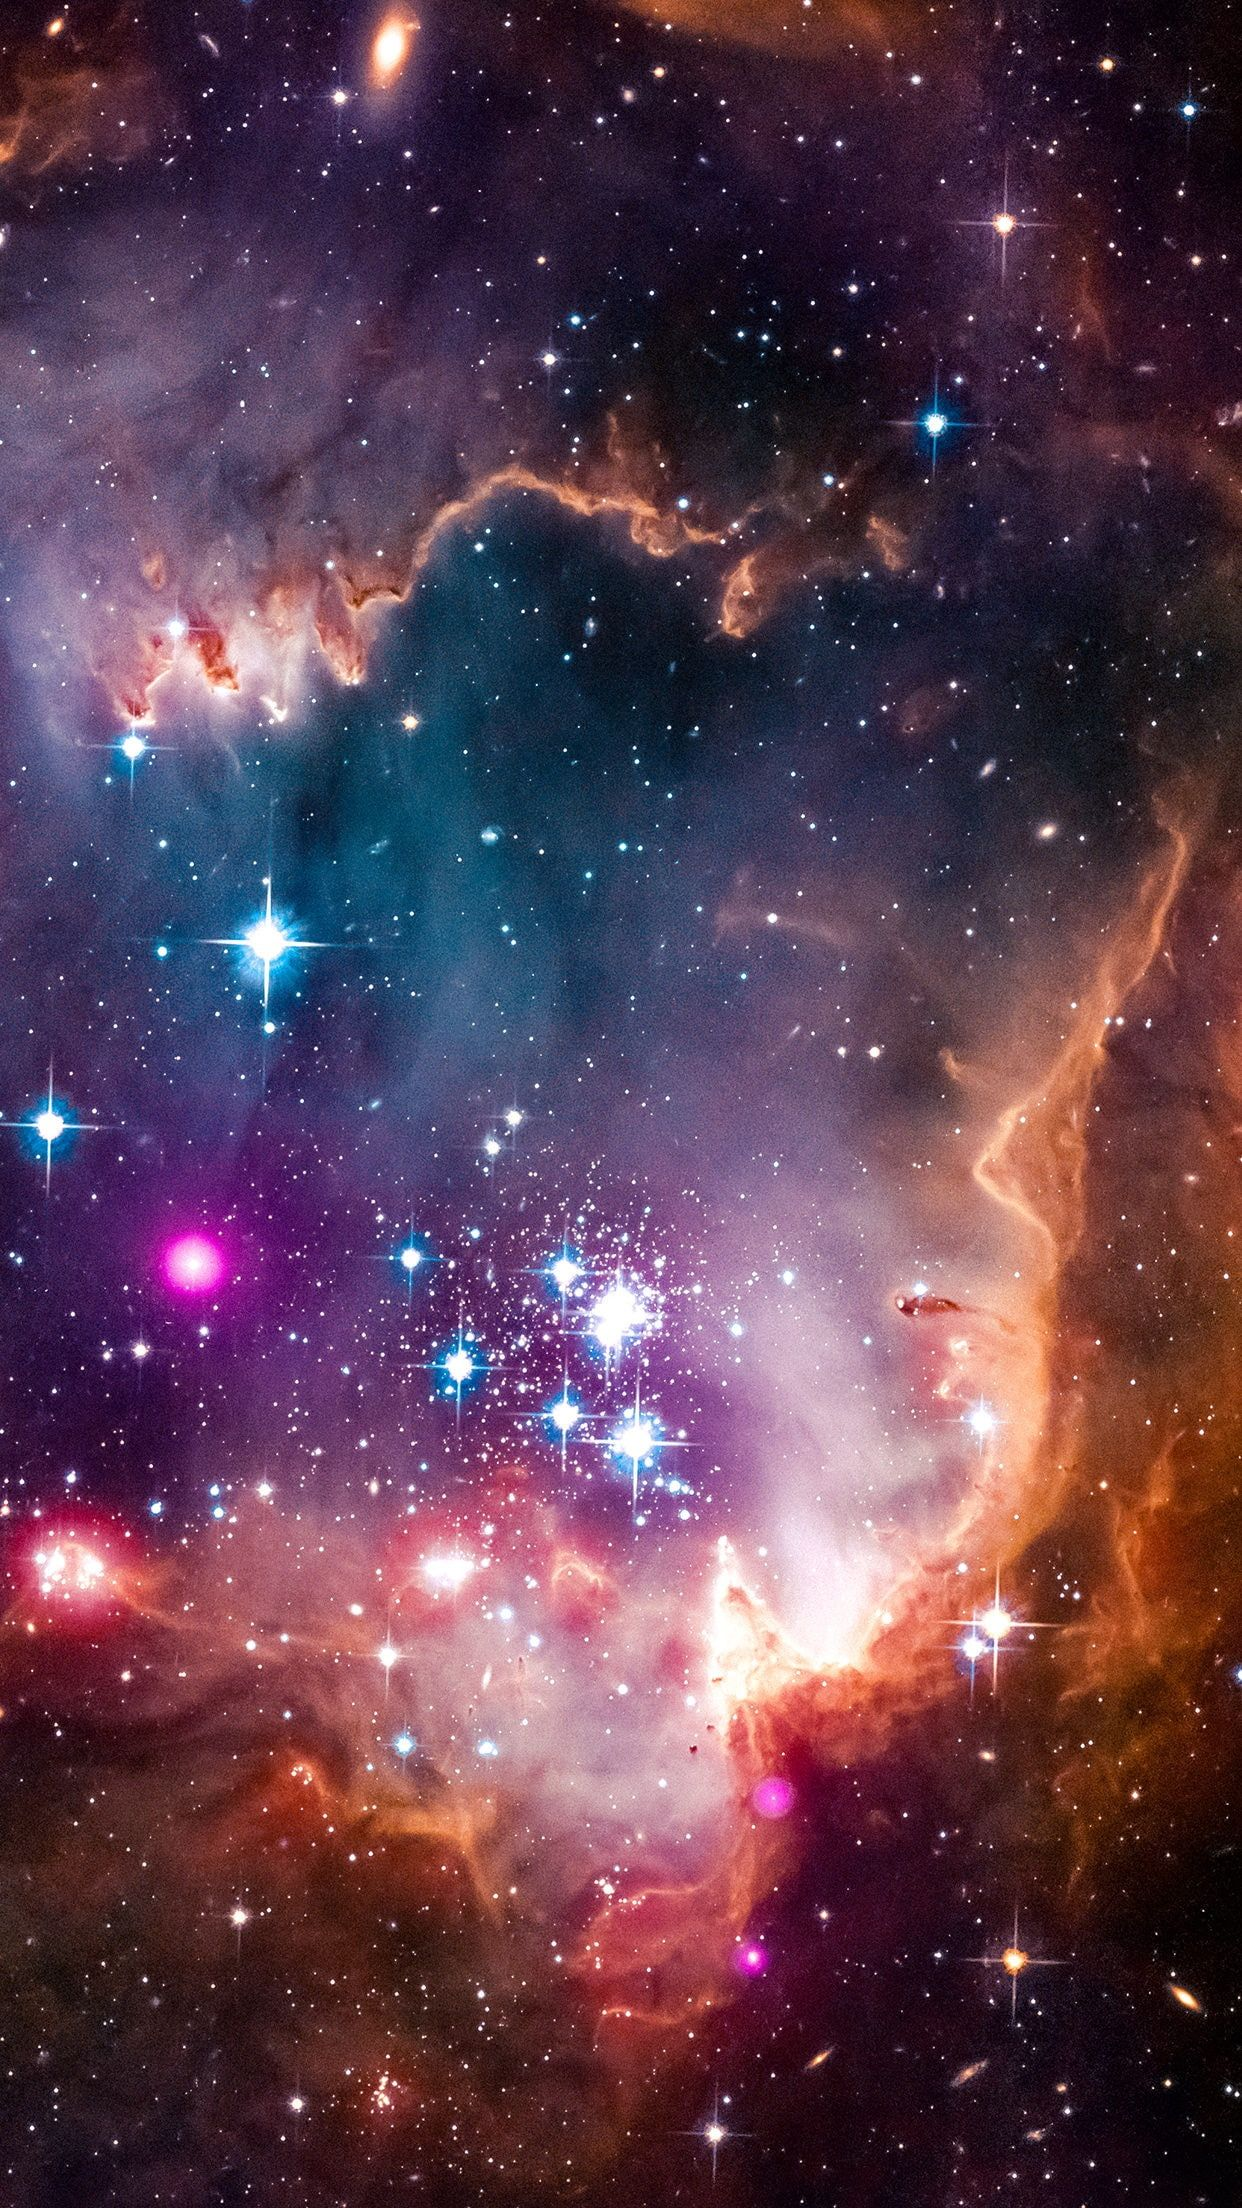 Space Galaxy Vertical Portrait Display 1080p Wallpaper Hdwallpaper Desktop Hubble Space Telescope Nebula Spitzer Space Telescope